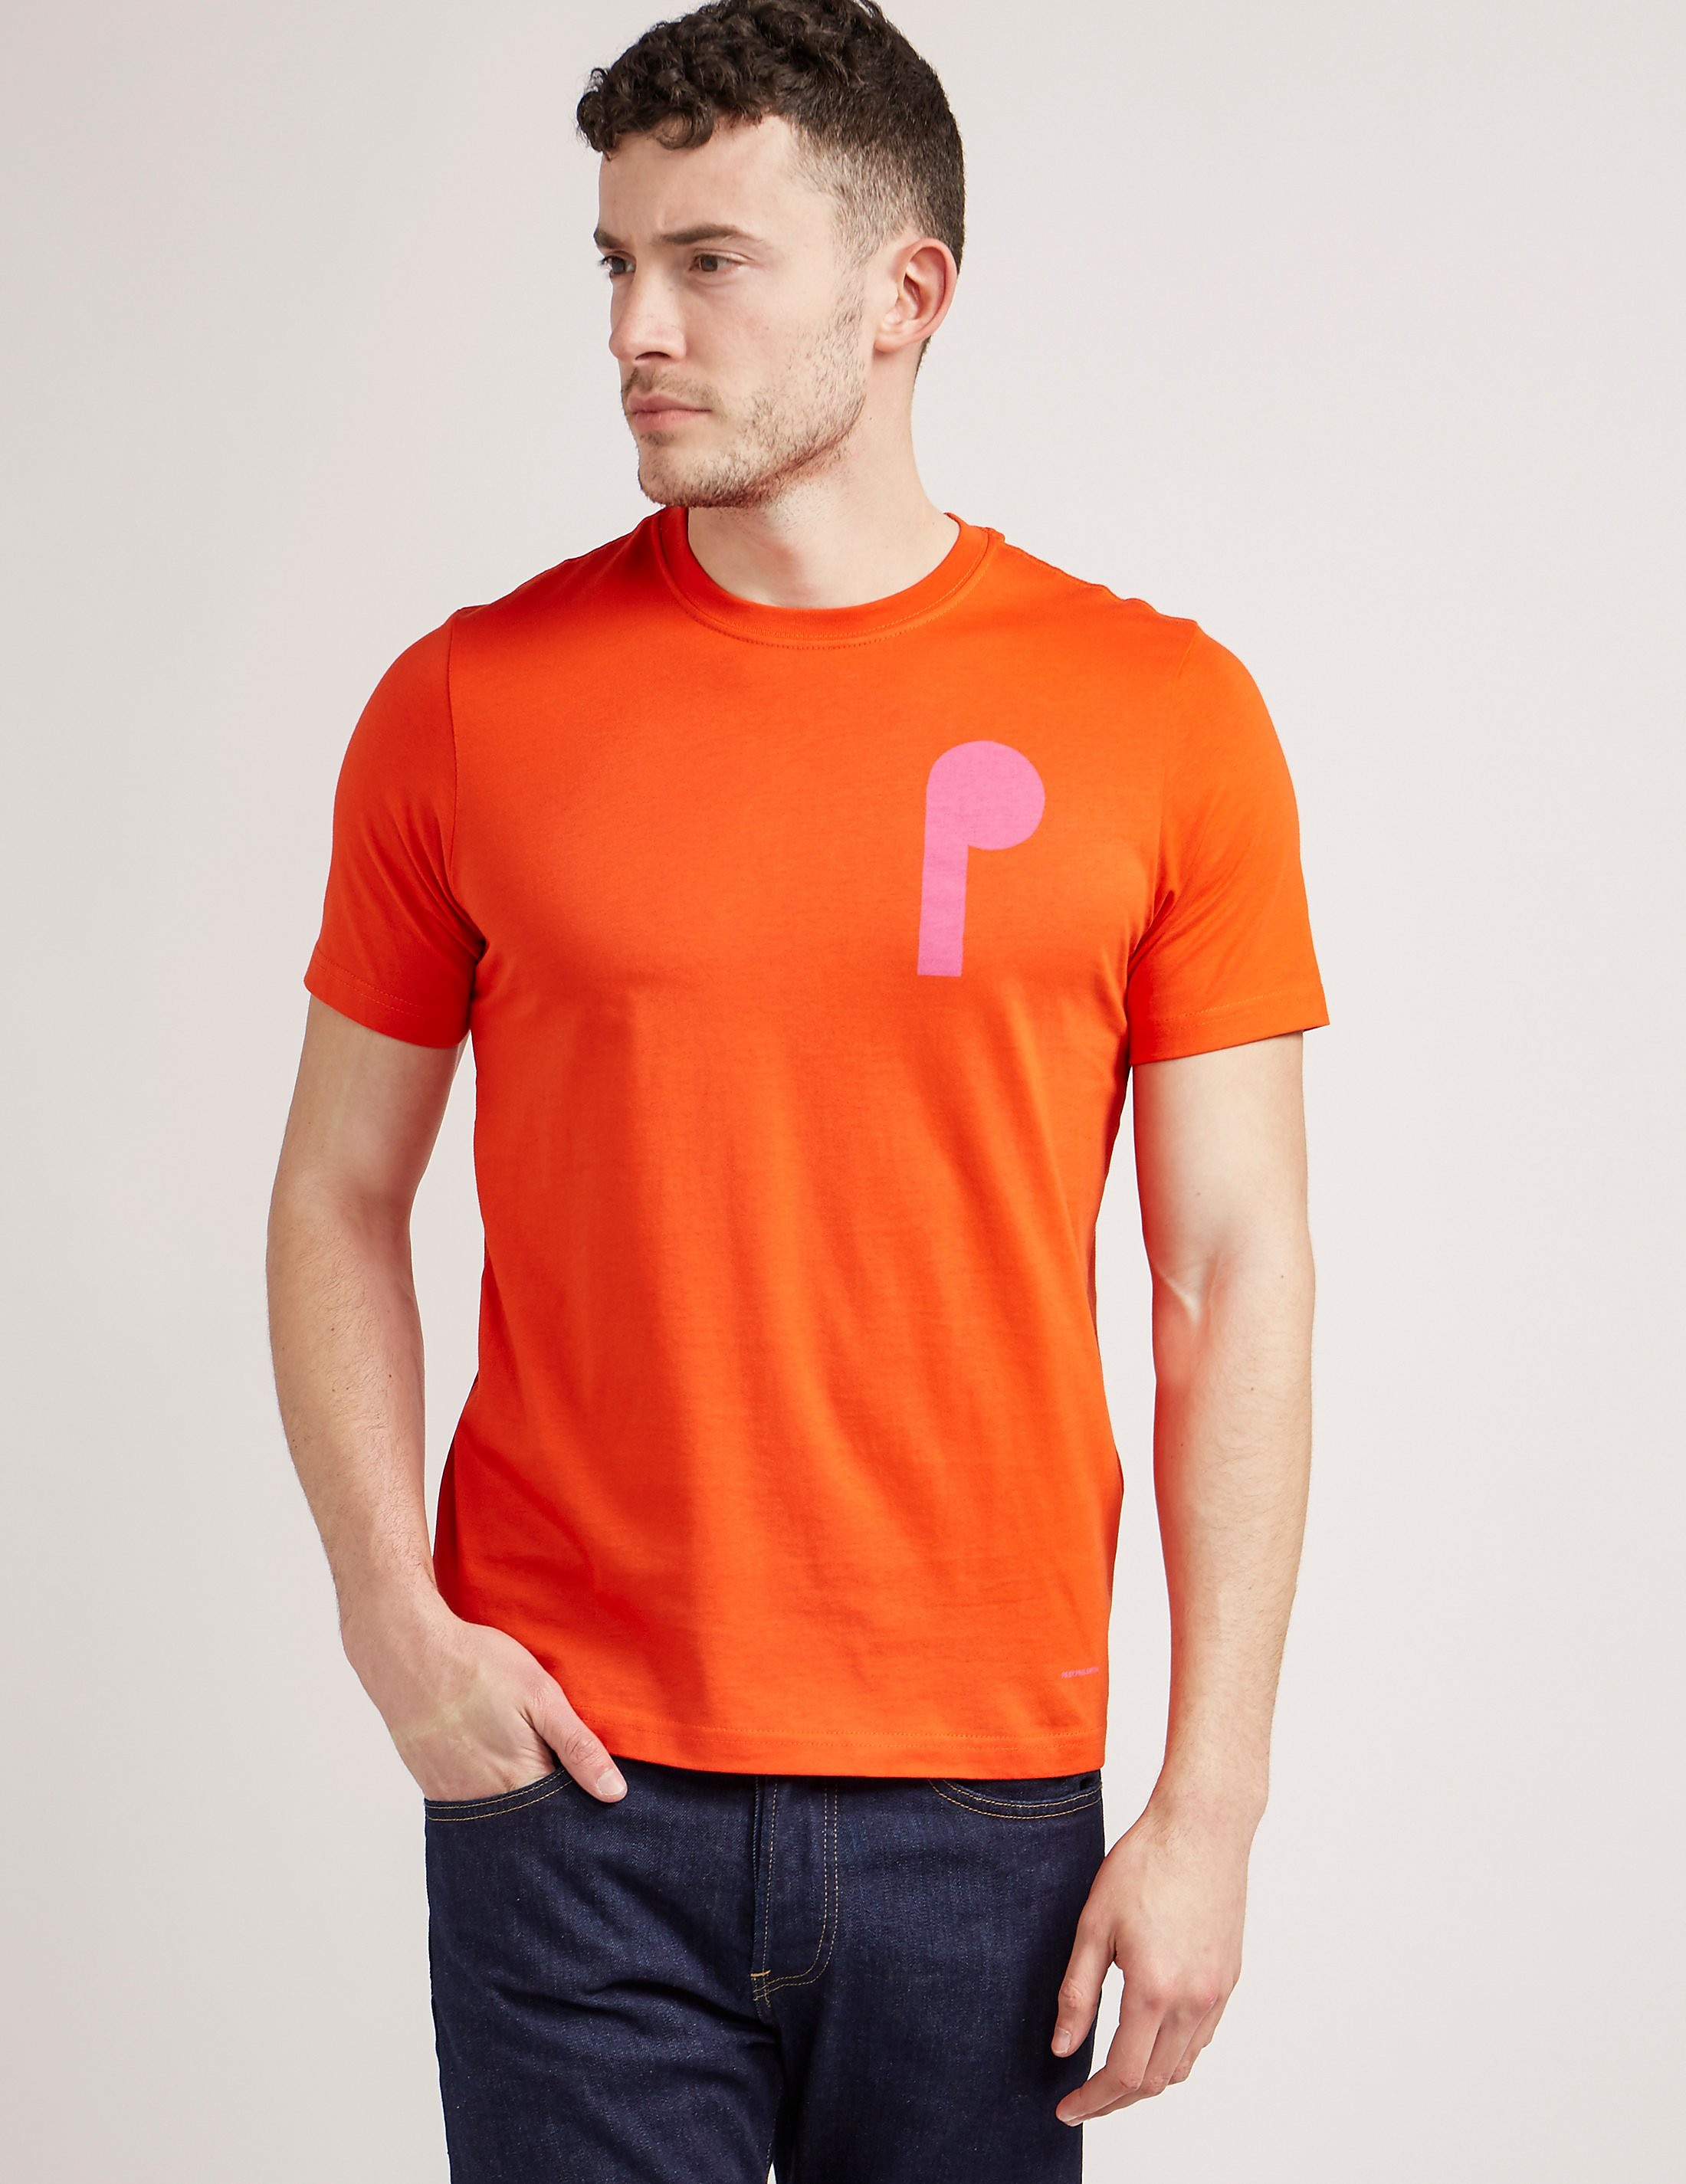 Paul Smith Short Sleeve Print T-Shirt